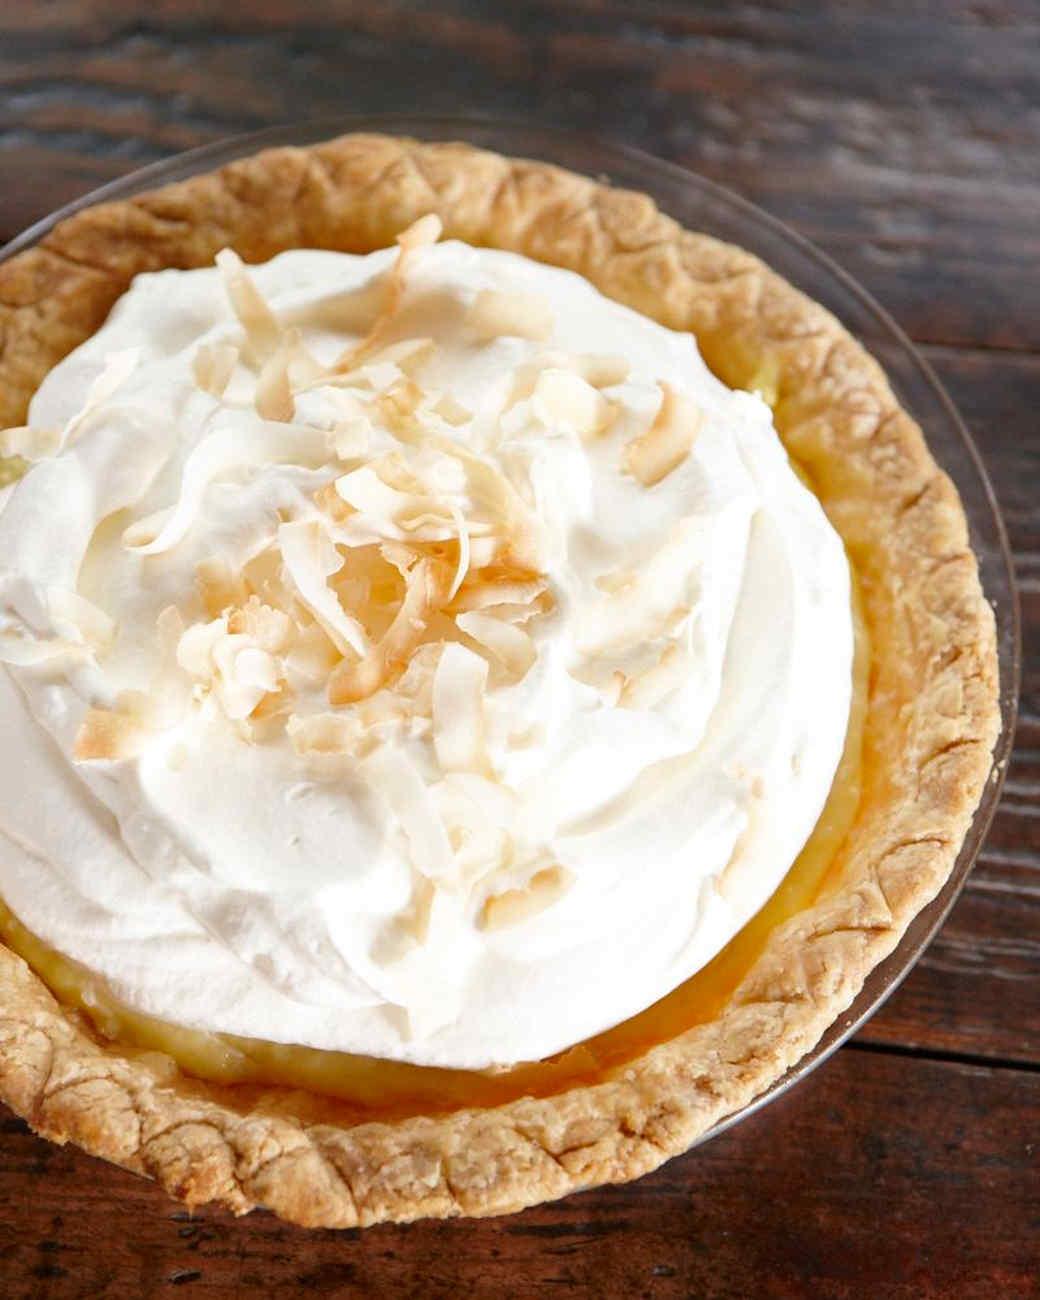 coconut-cream-pie-001-ld107757.jpg